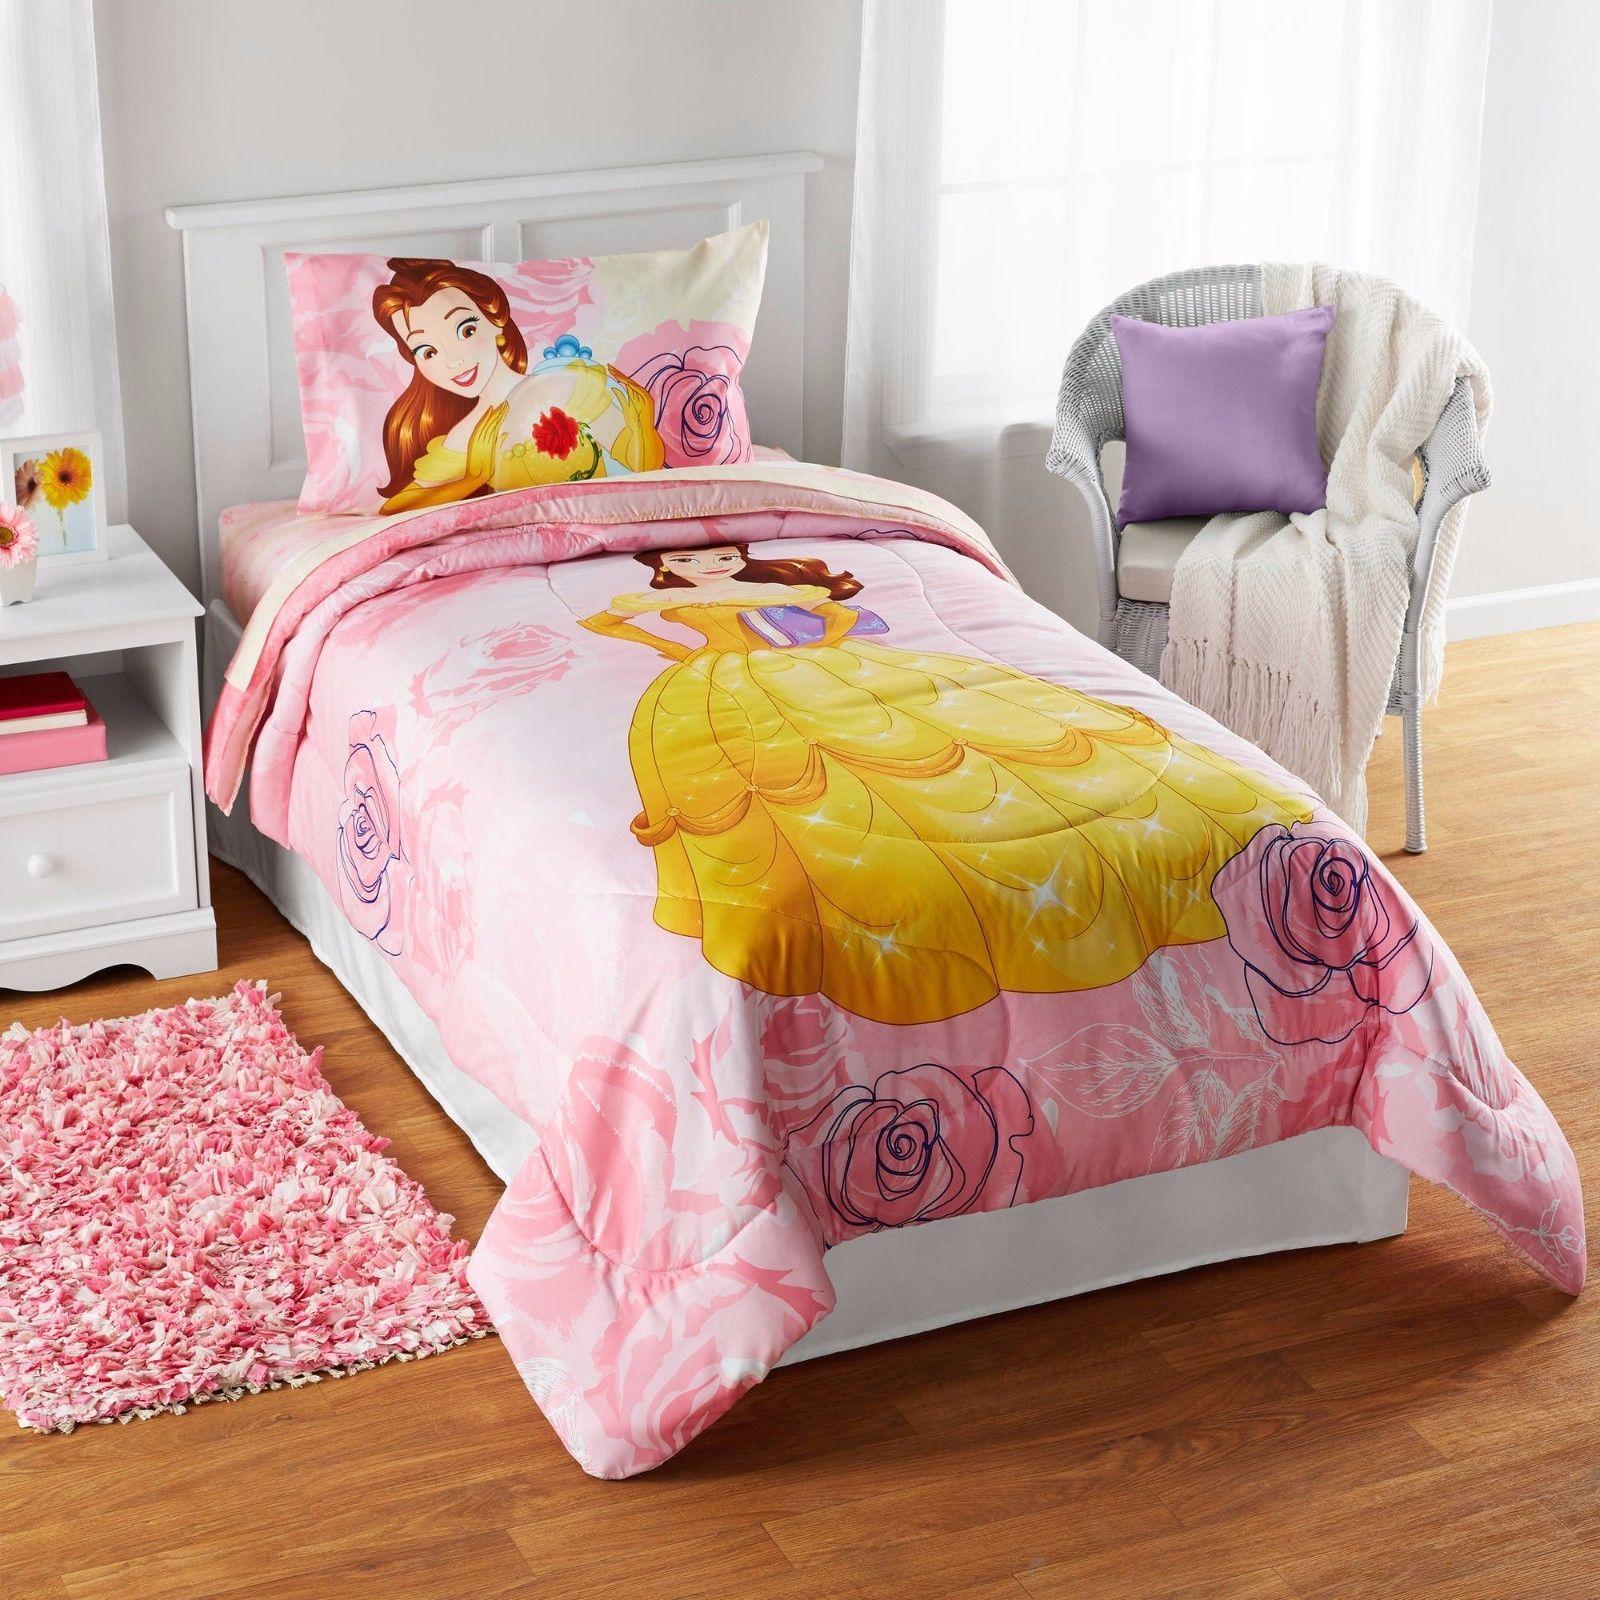 Disney Princess Comforter Set Cinderella Blanket Sham Twin Bed Princess Bedding Set Princess Bed Disney Princess Bedding